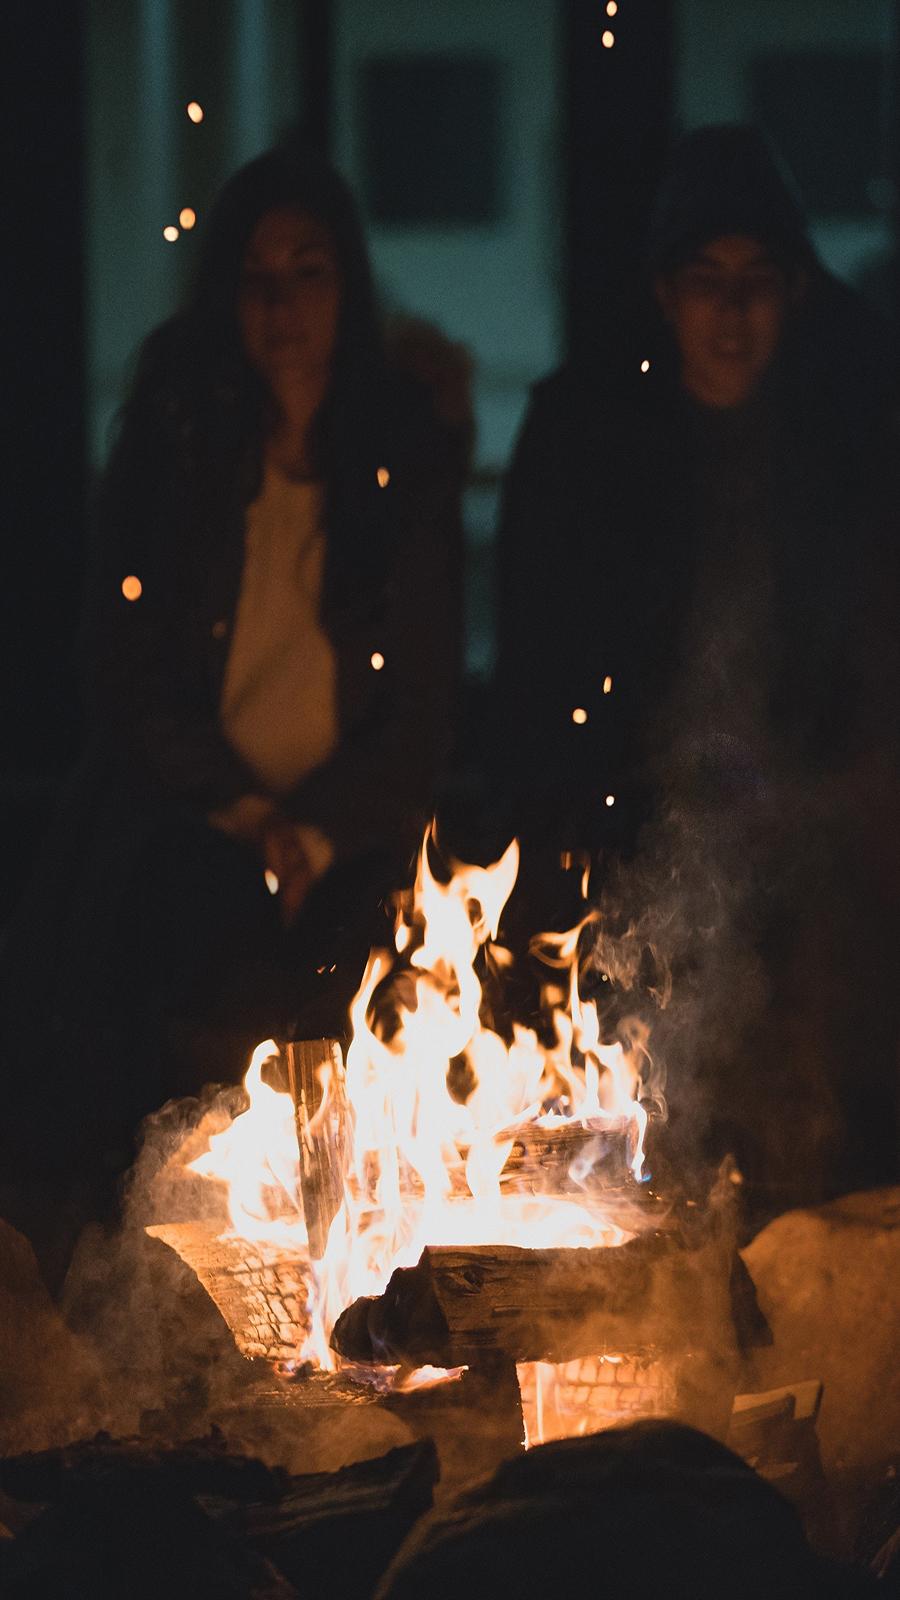 Fire, Camp, Night Wallpapers Free Download Phone & Desktop